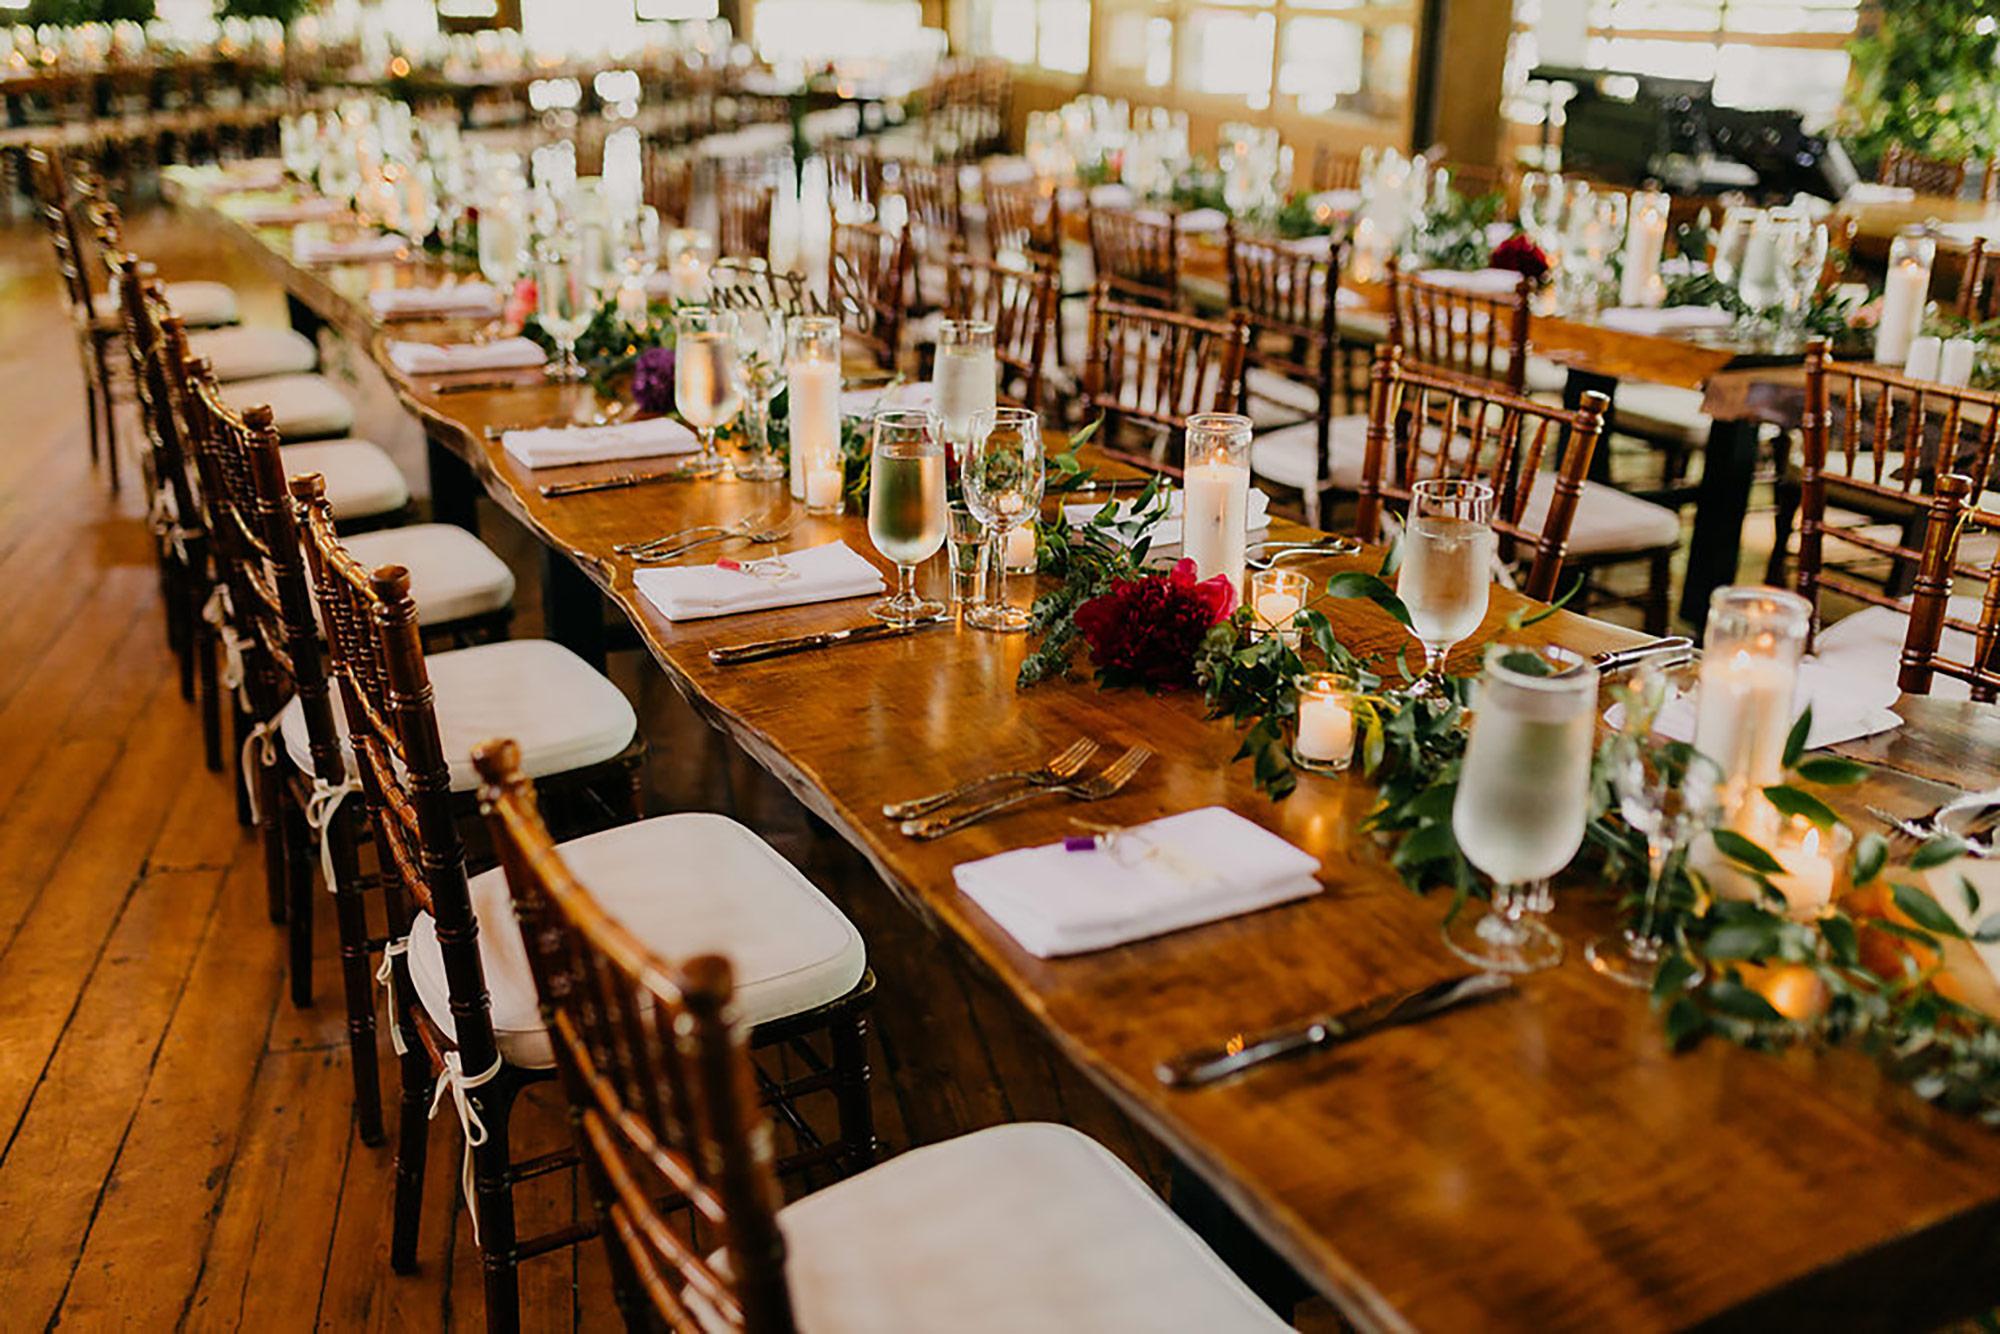 Kurtz-Orchards-Wedding-Niagara-wedding-Vineyard-Bride-Photography-by-Kayla-Rocca-043.JPG